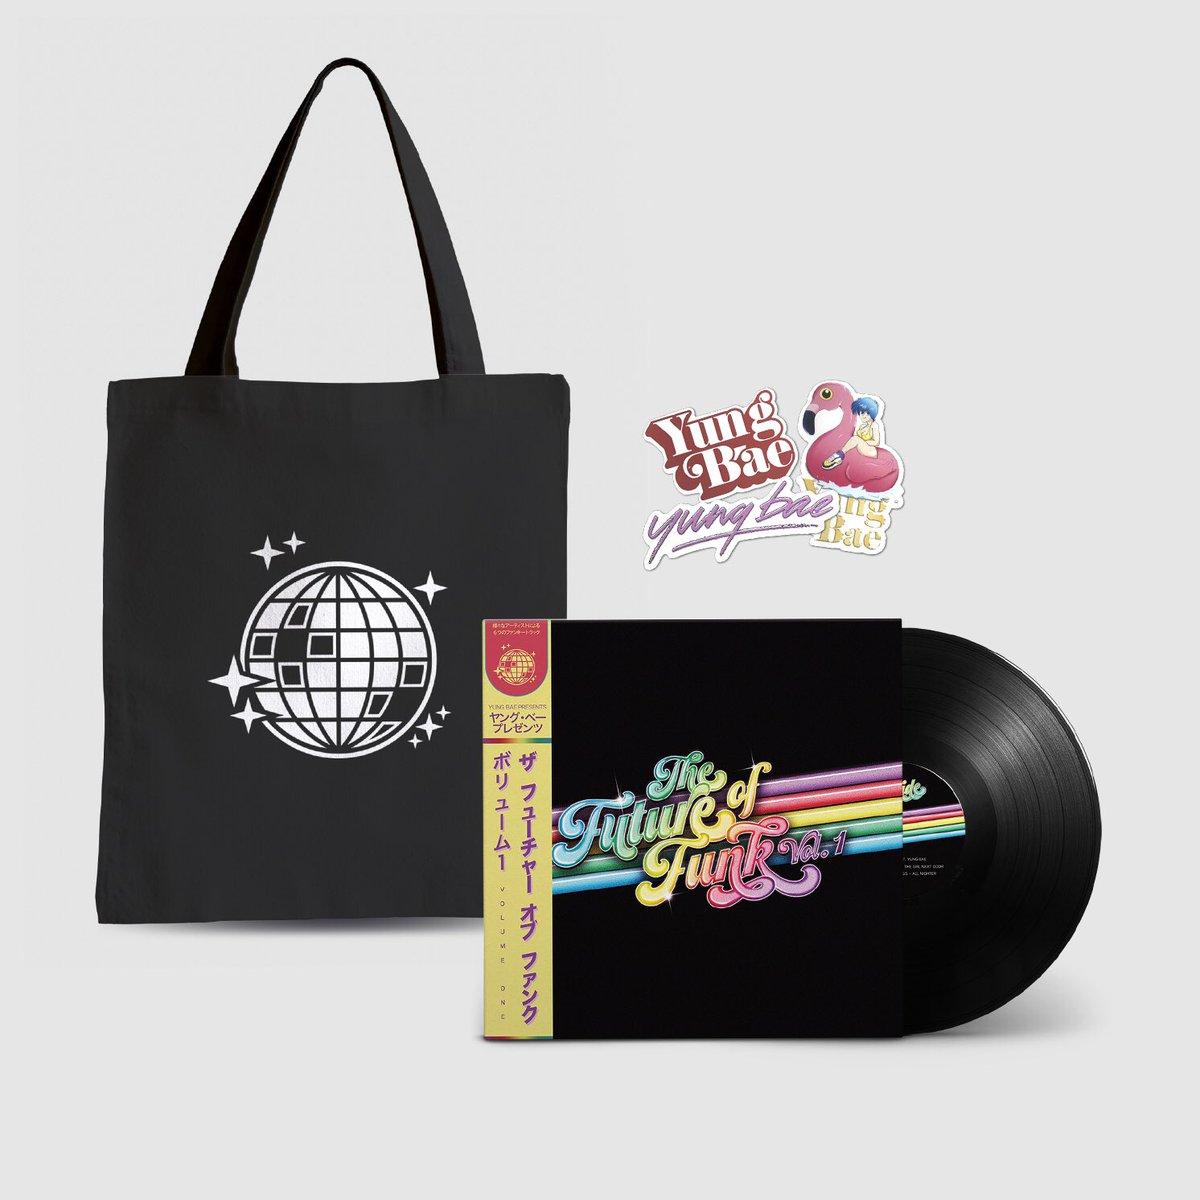 3/27/2019 - Cassettes / Vinyl Release & News 1